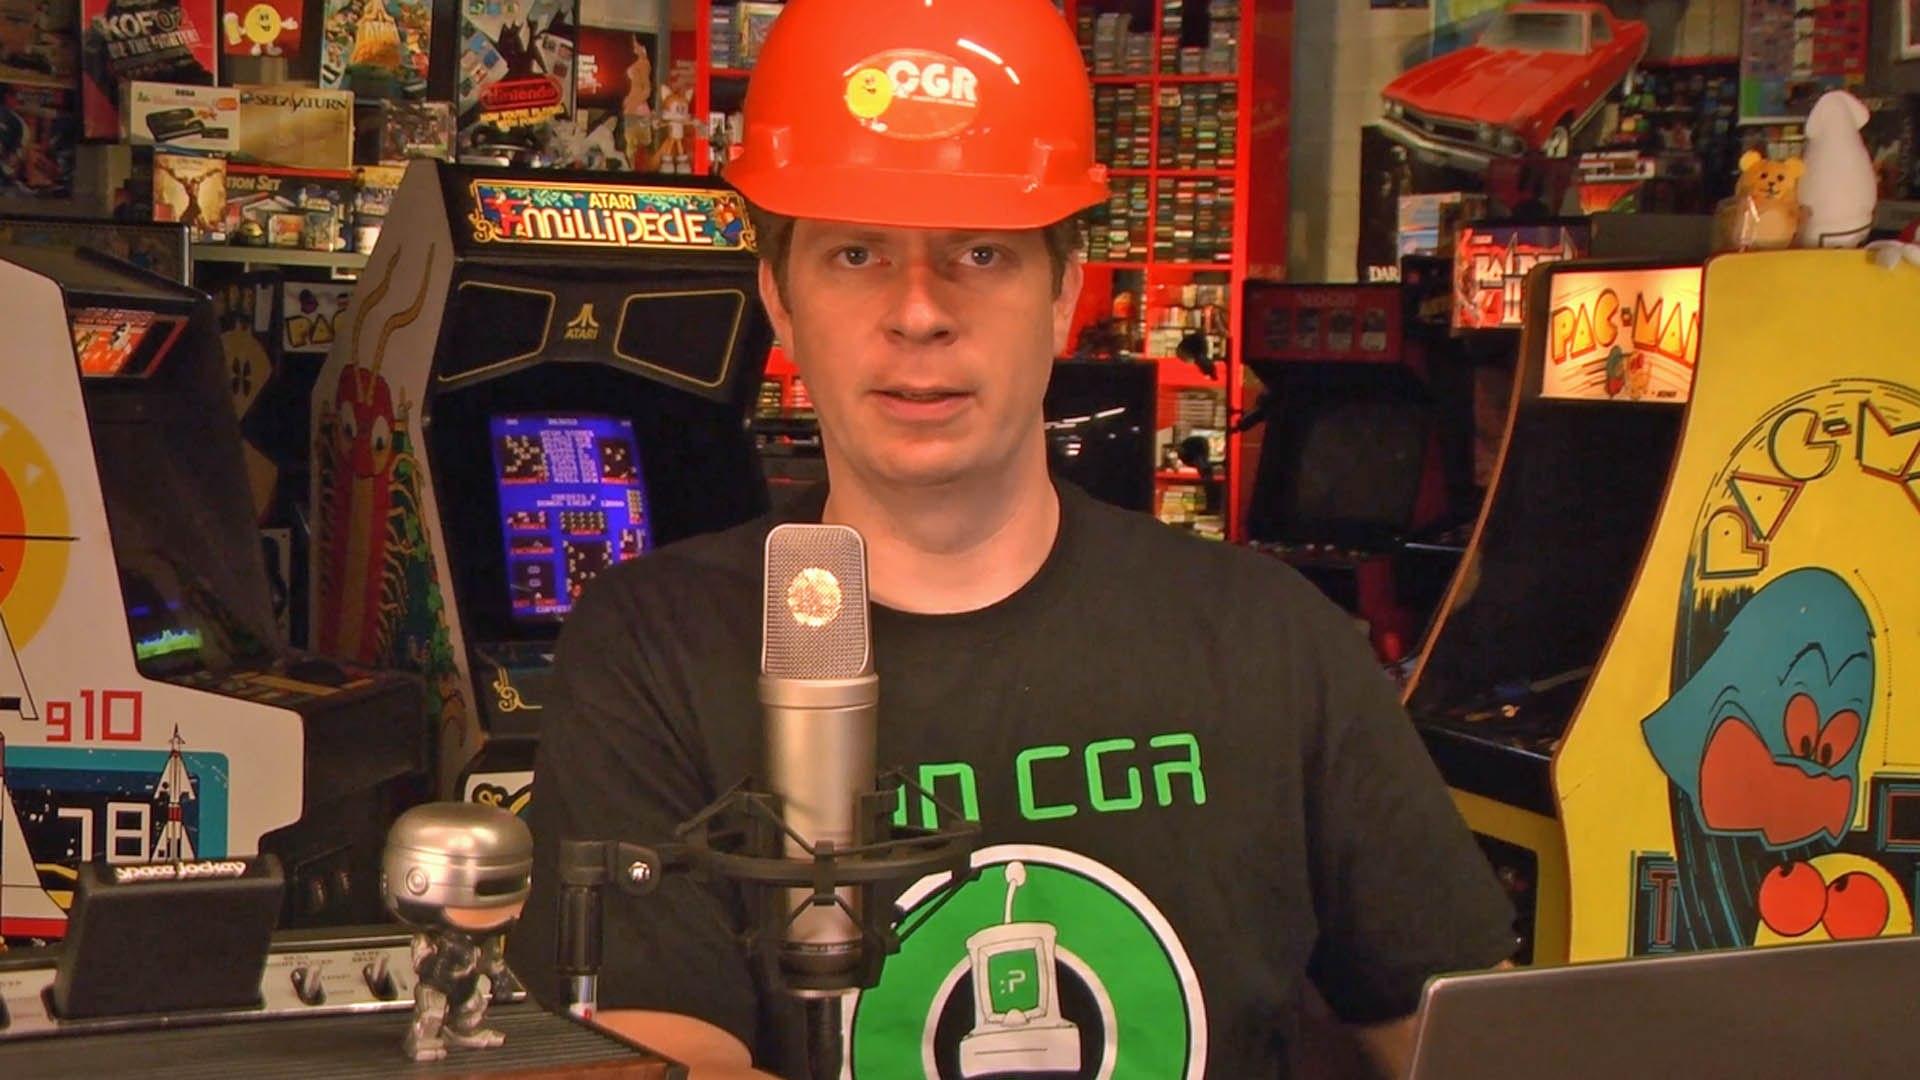 Classic Game Room Q&A - Games, Games, Games, Games, Games